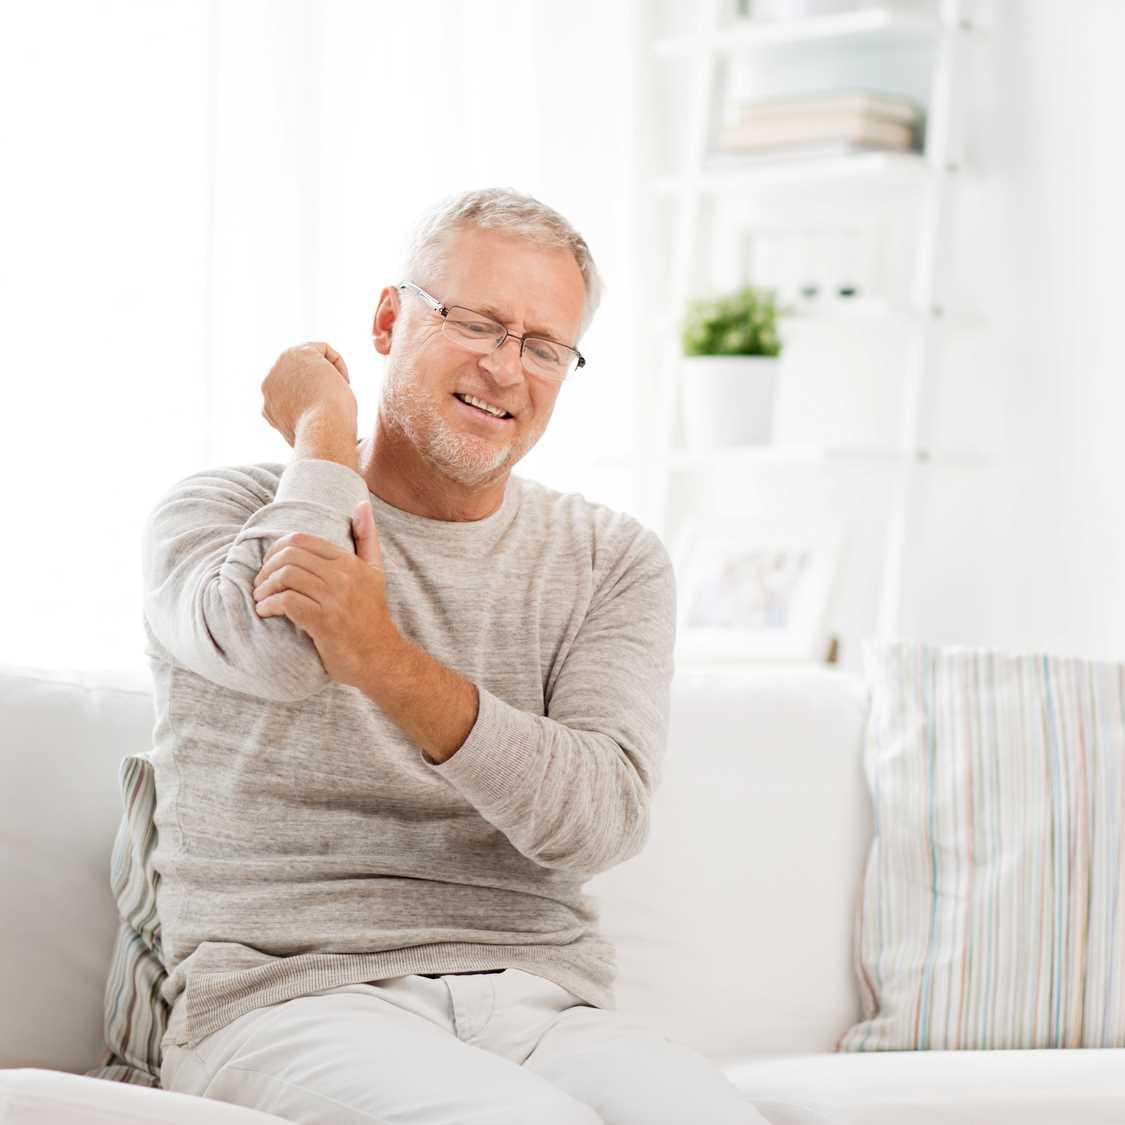 Harshman Chiropractic Osteoarthritis Arthritis Relief